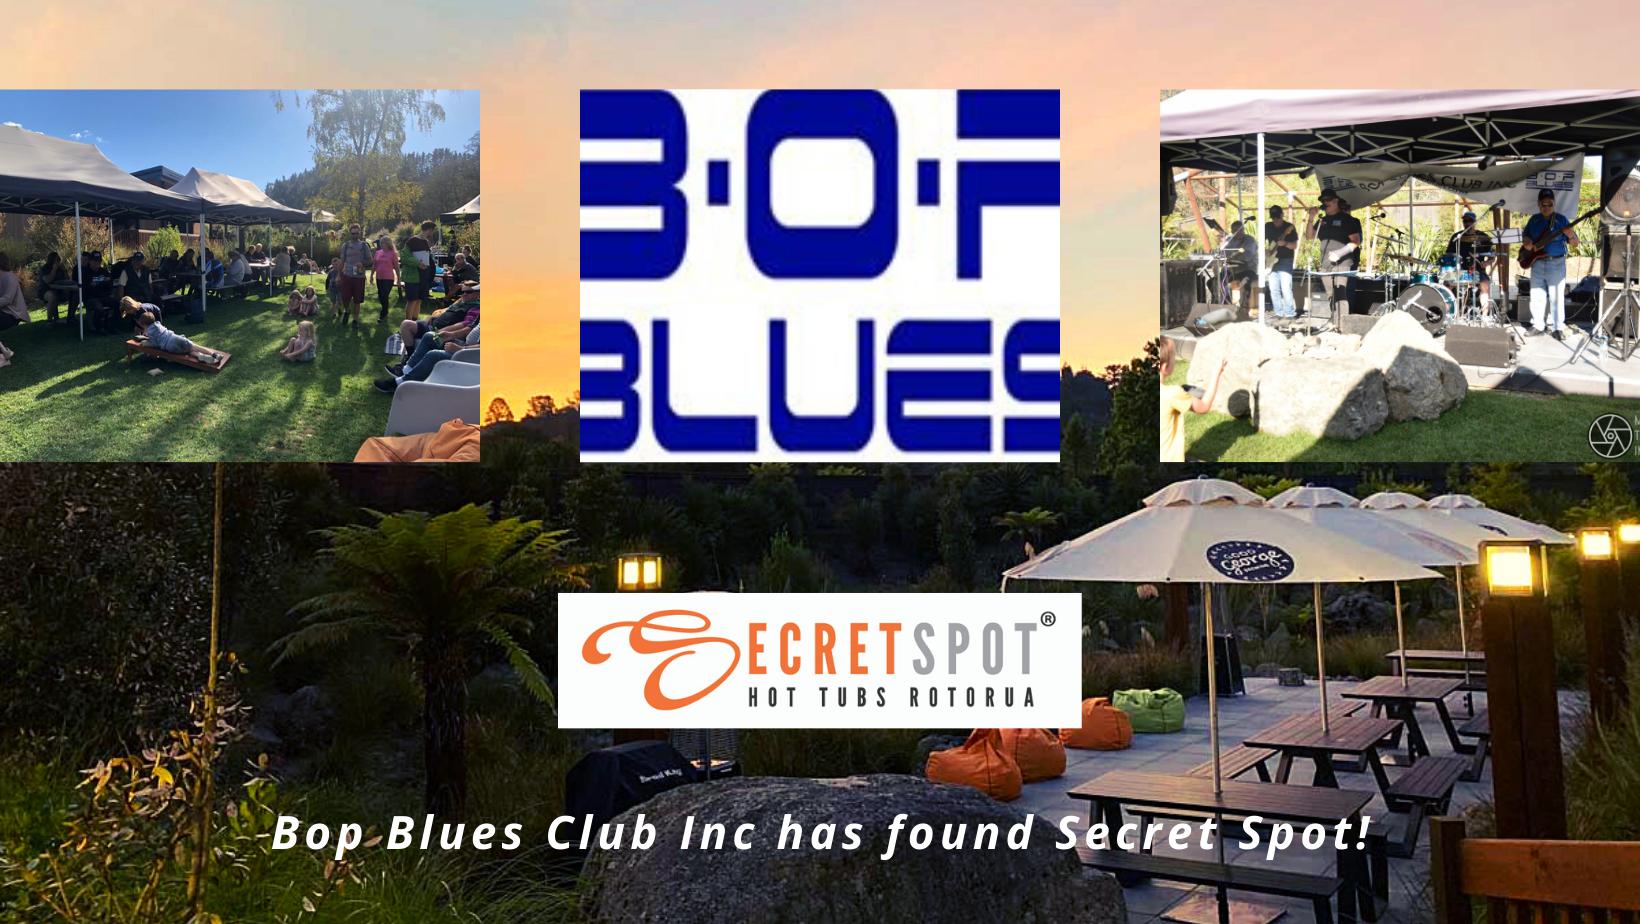 Bop Blues has found Secret Spot 4 b